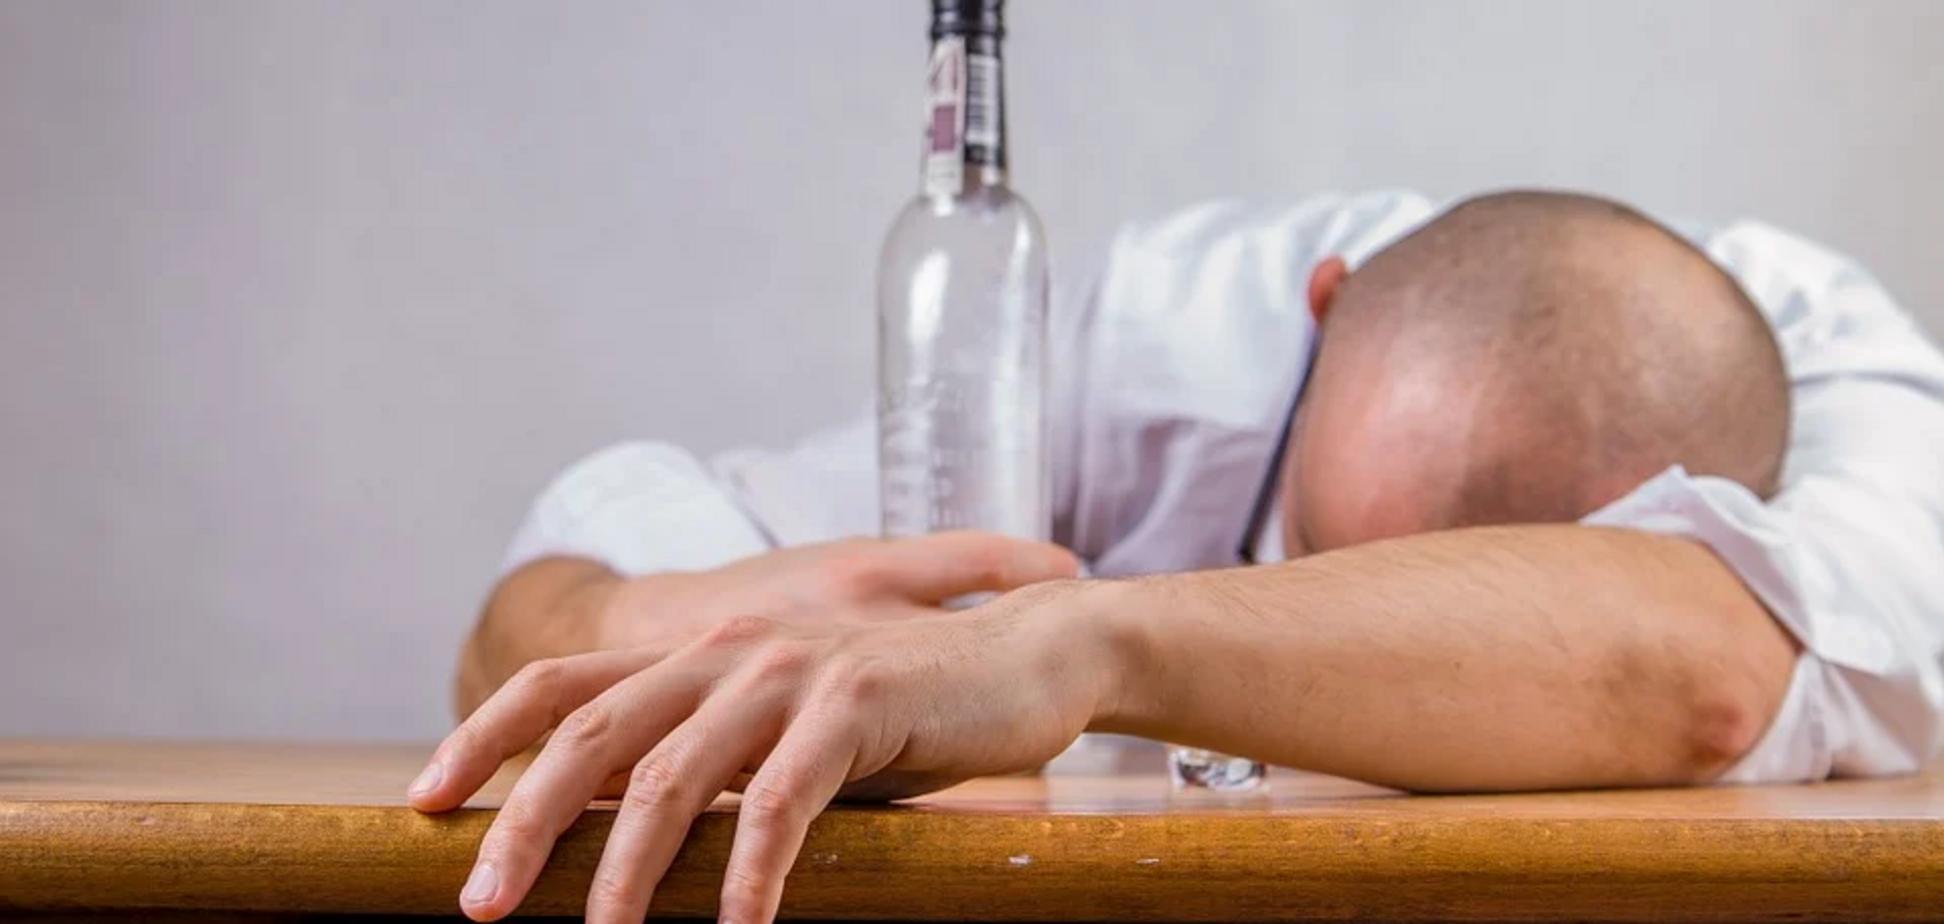 Пити алкоголь при застуді небезпечно